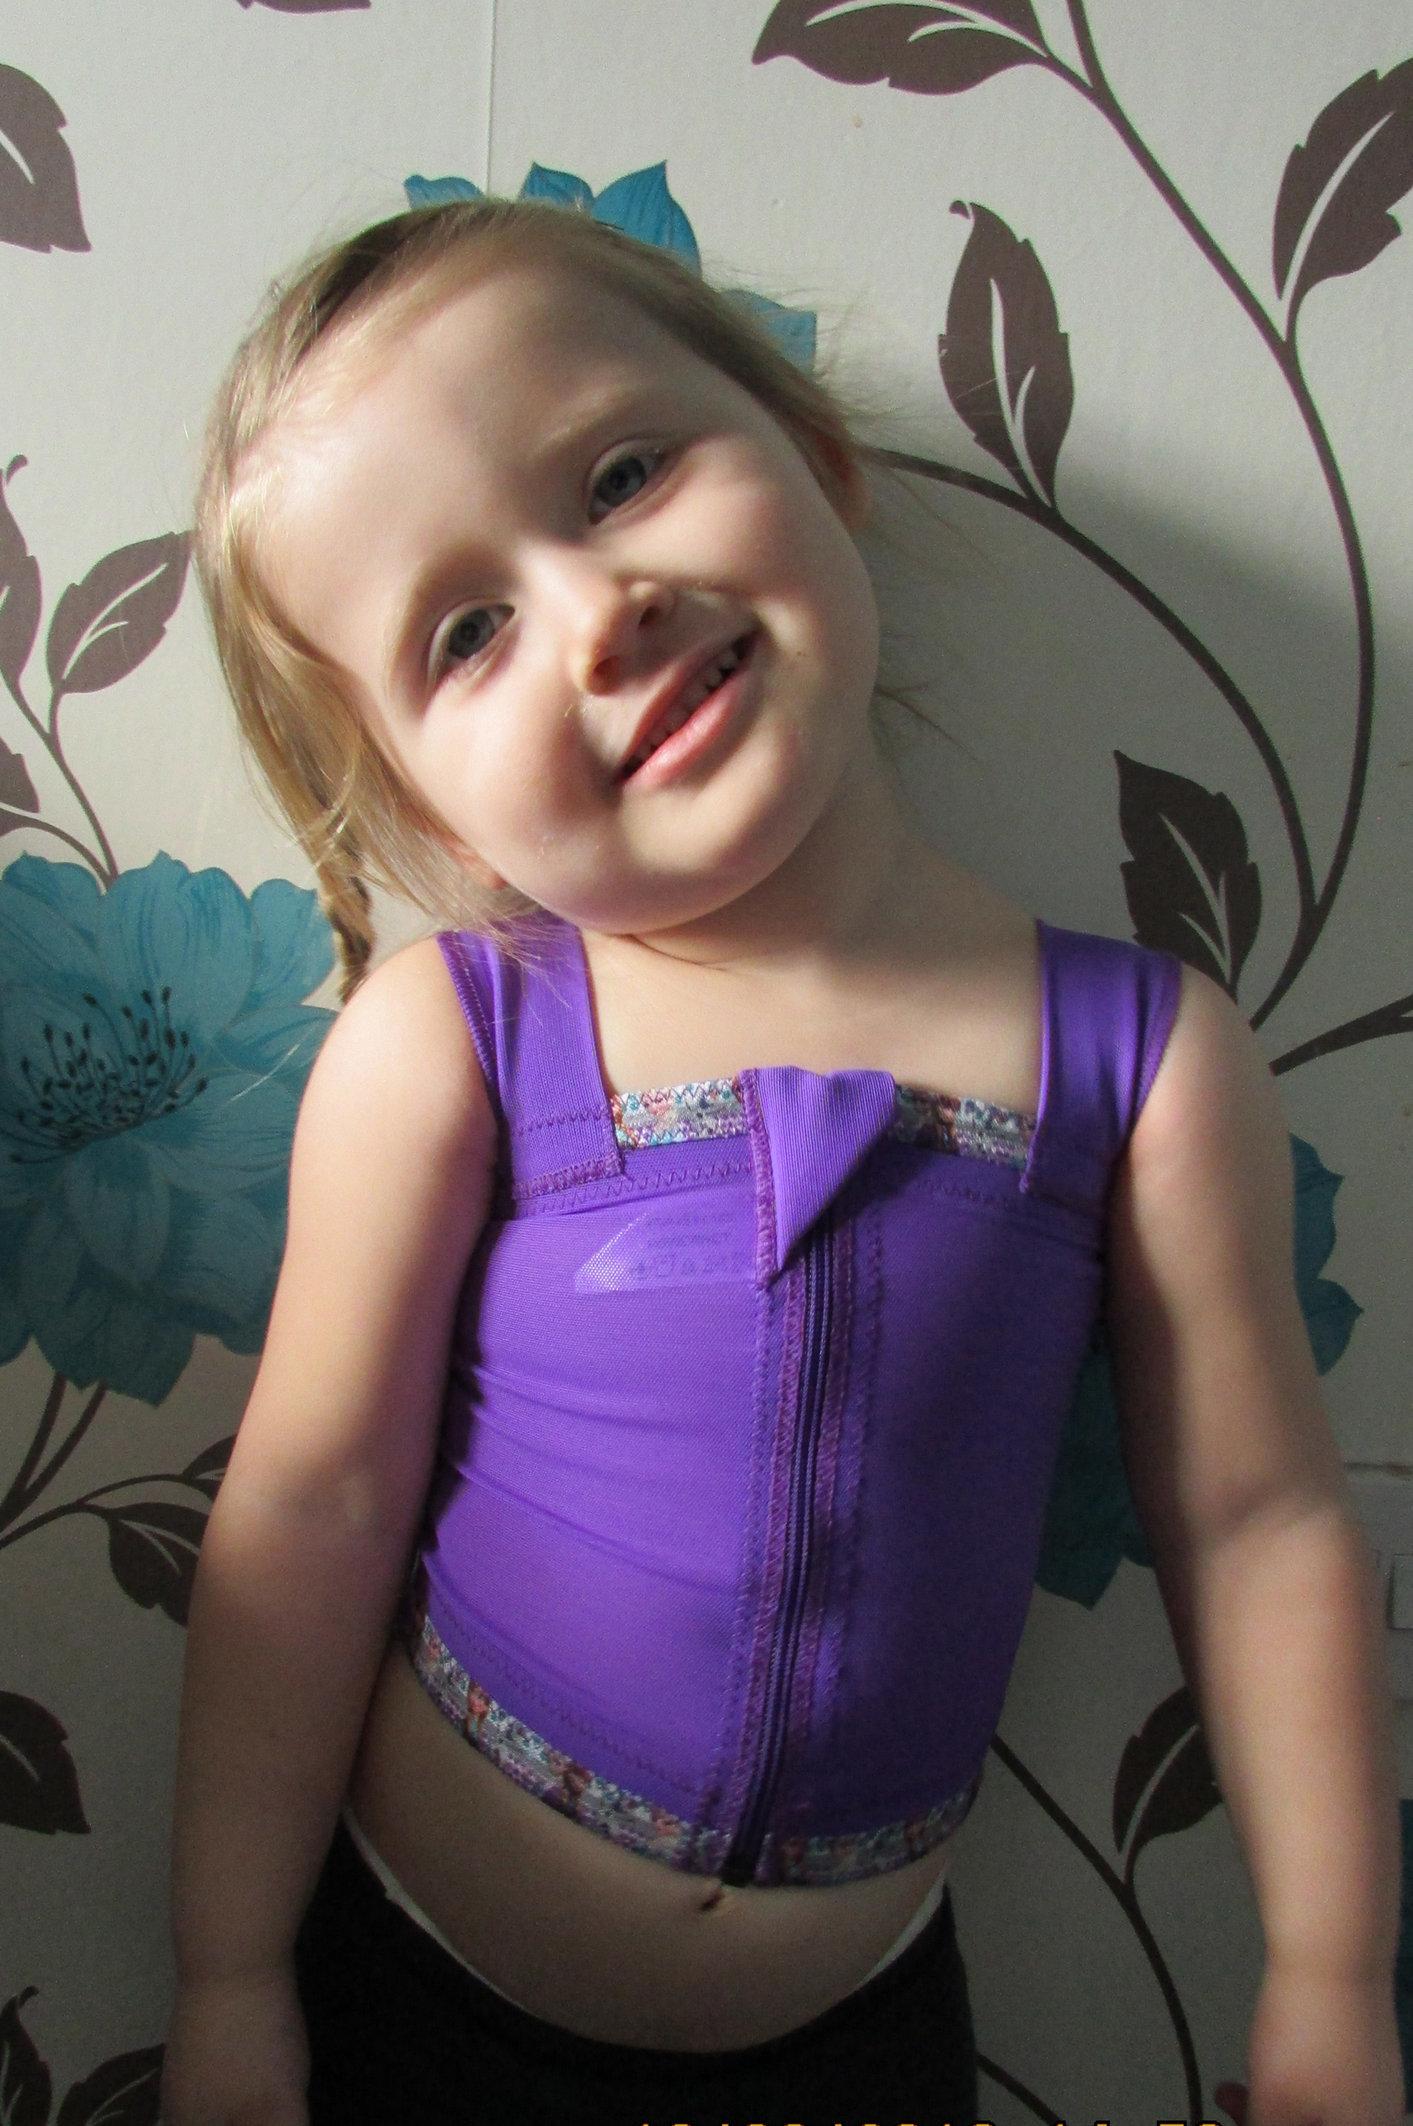 Bella Davey-Lawrence wearing her Frozen-inspired pressure